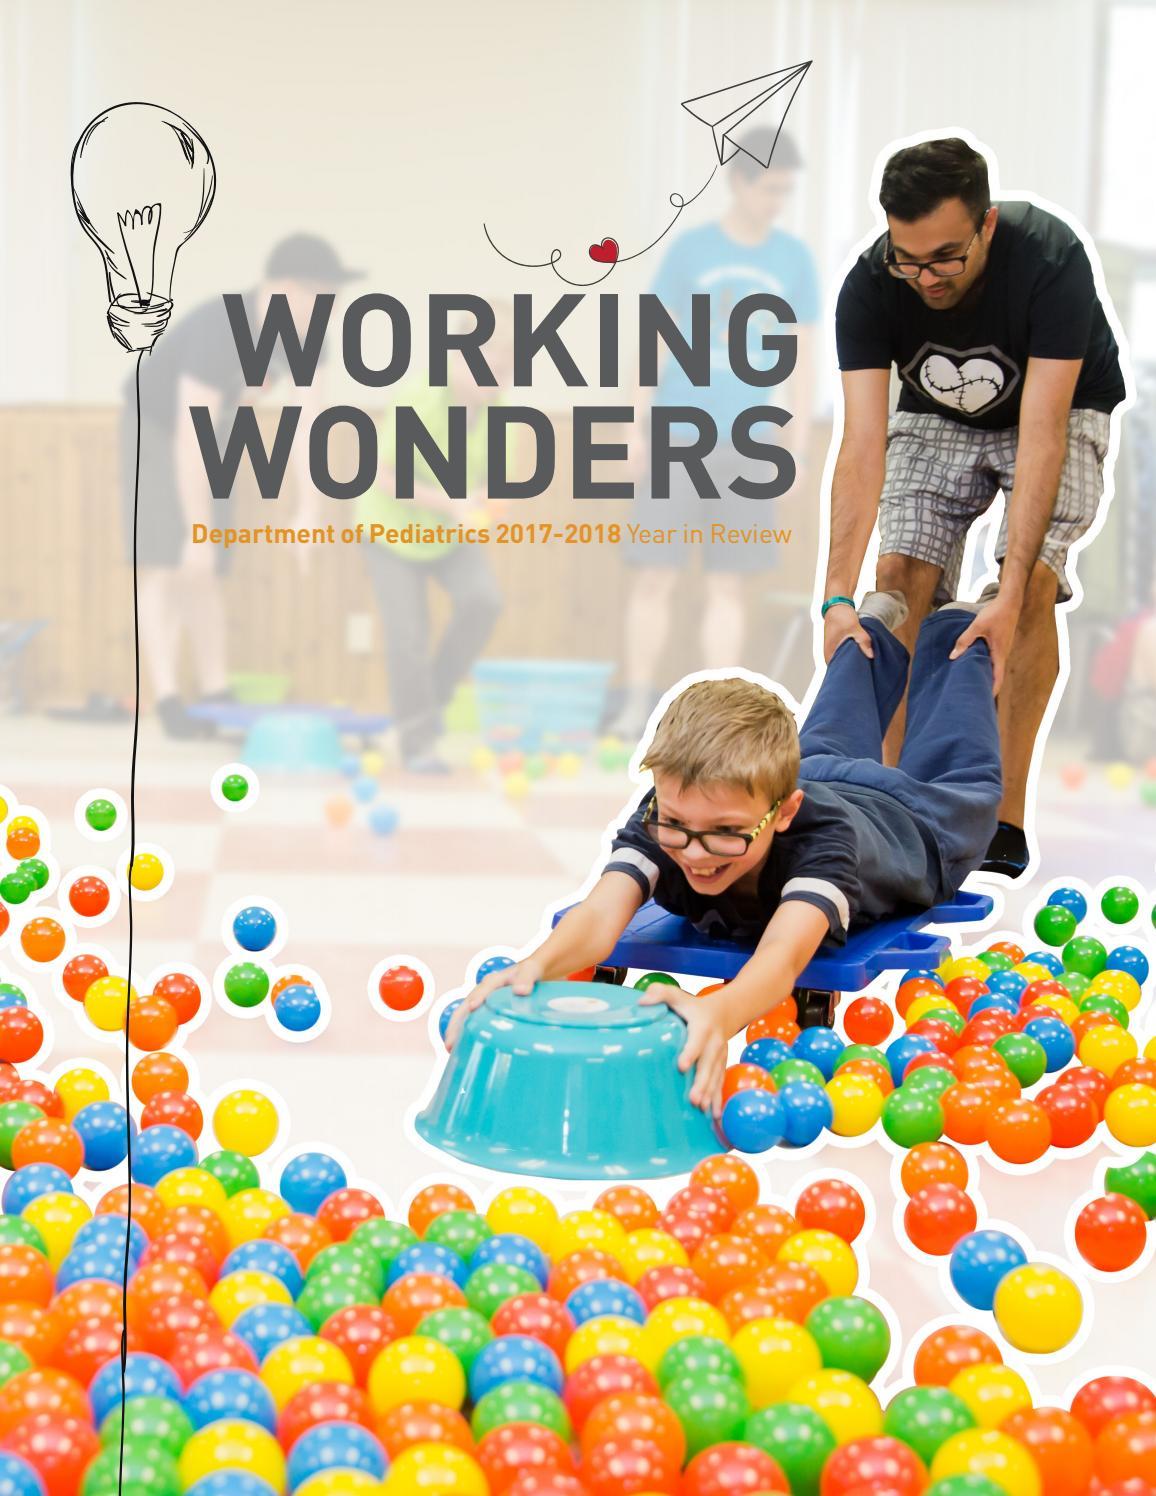 University of Alberta Department of Pediatrics - Working